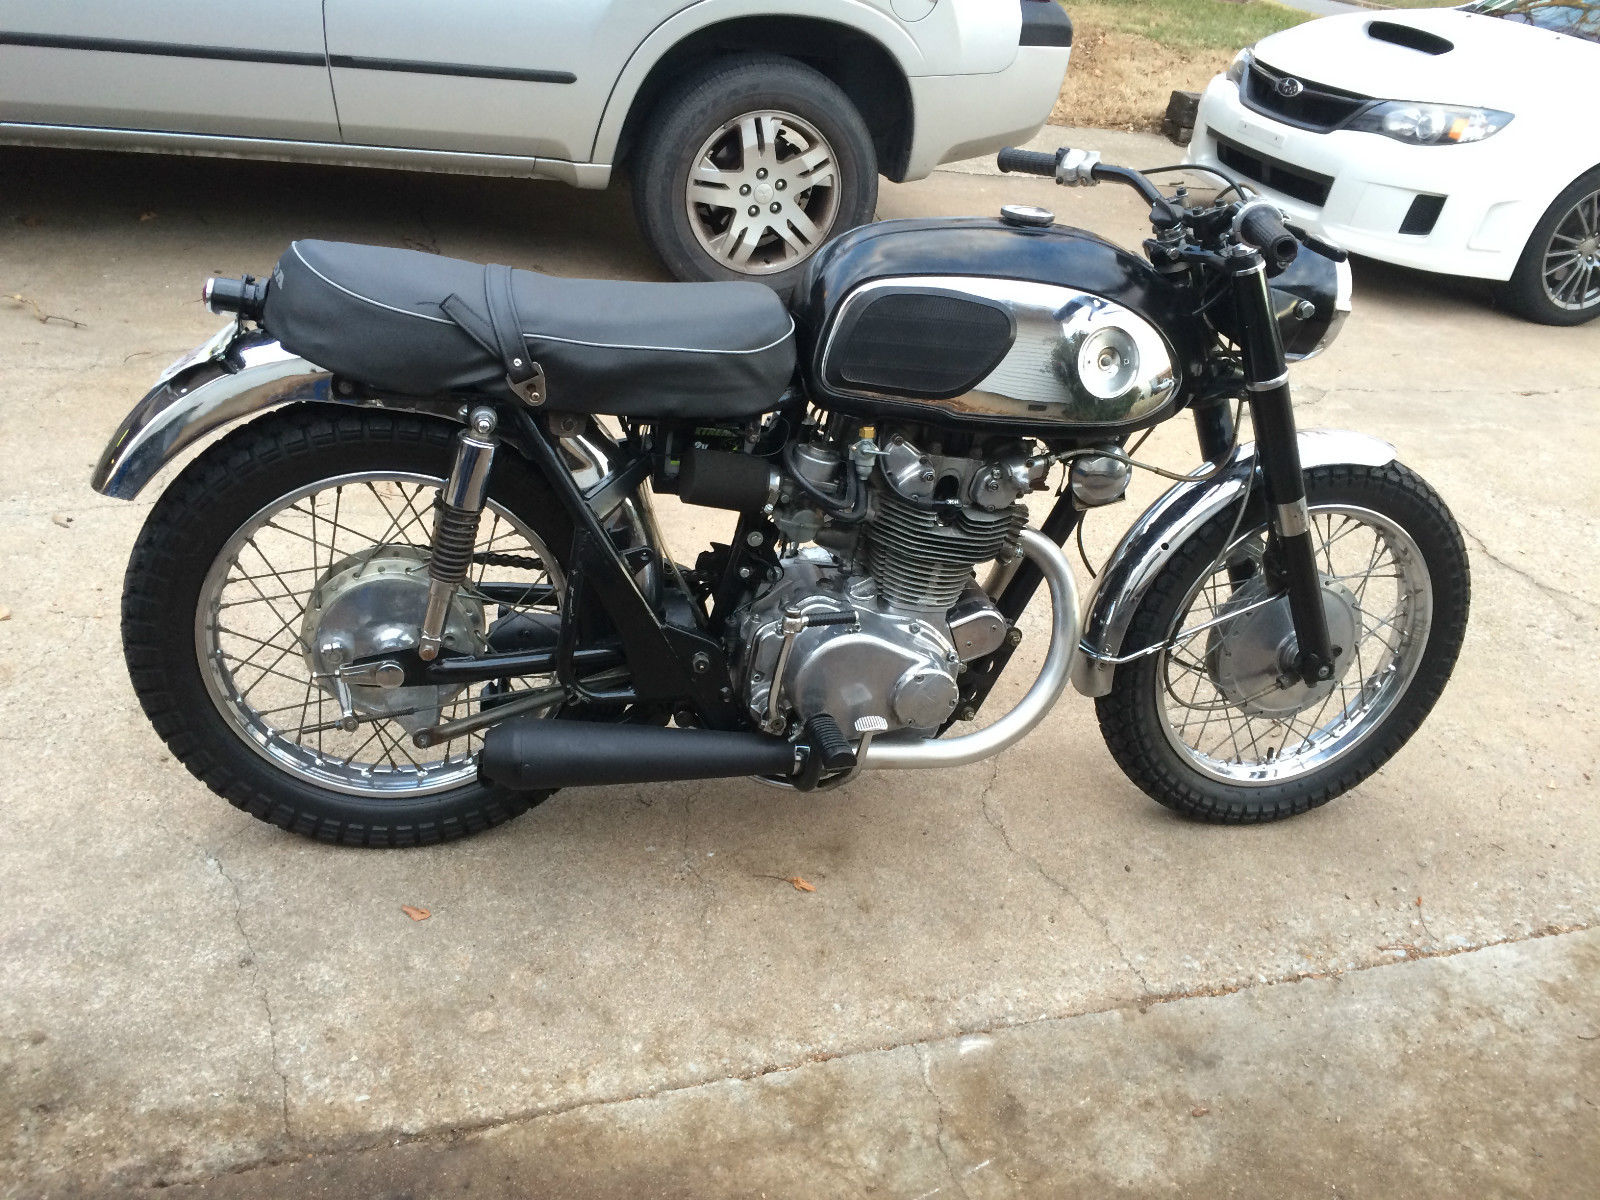 Honda CB450 Bobber, cafe racer, tracker - Authentic, vintage Brat